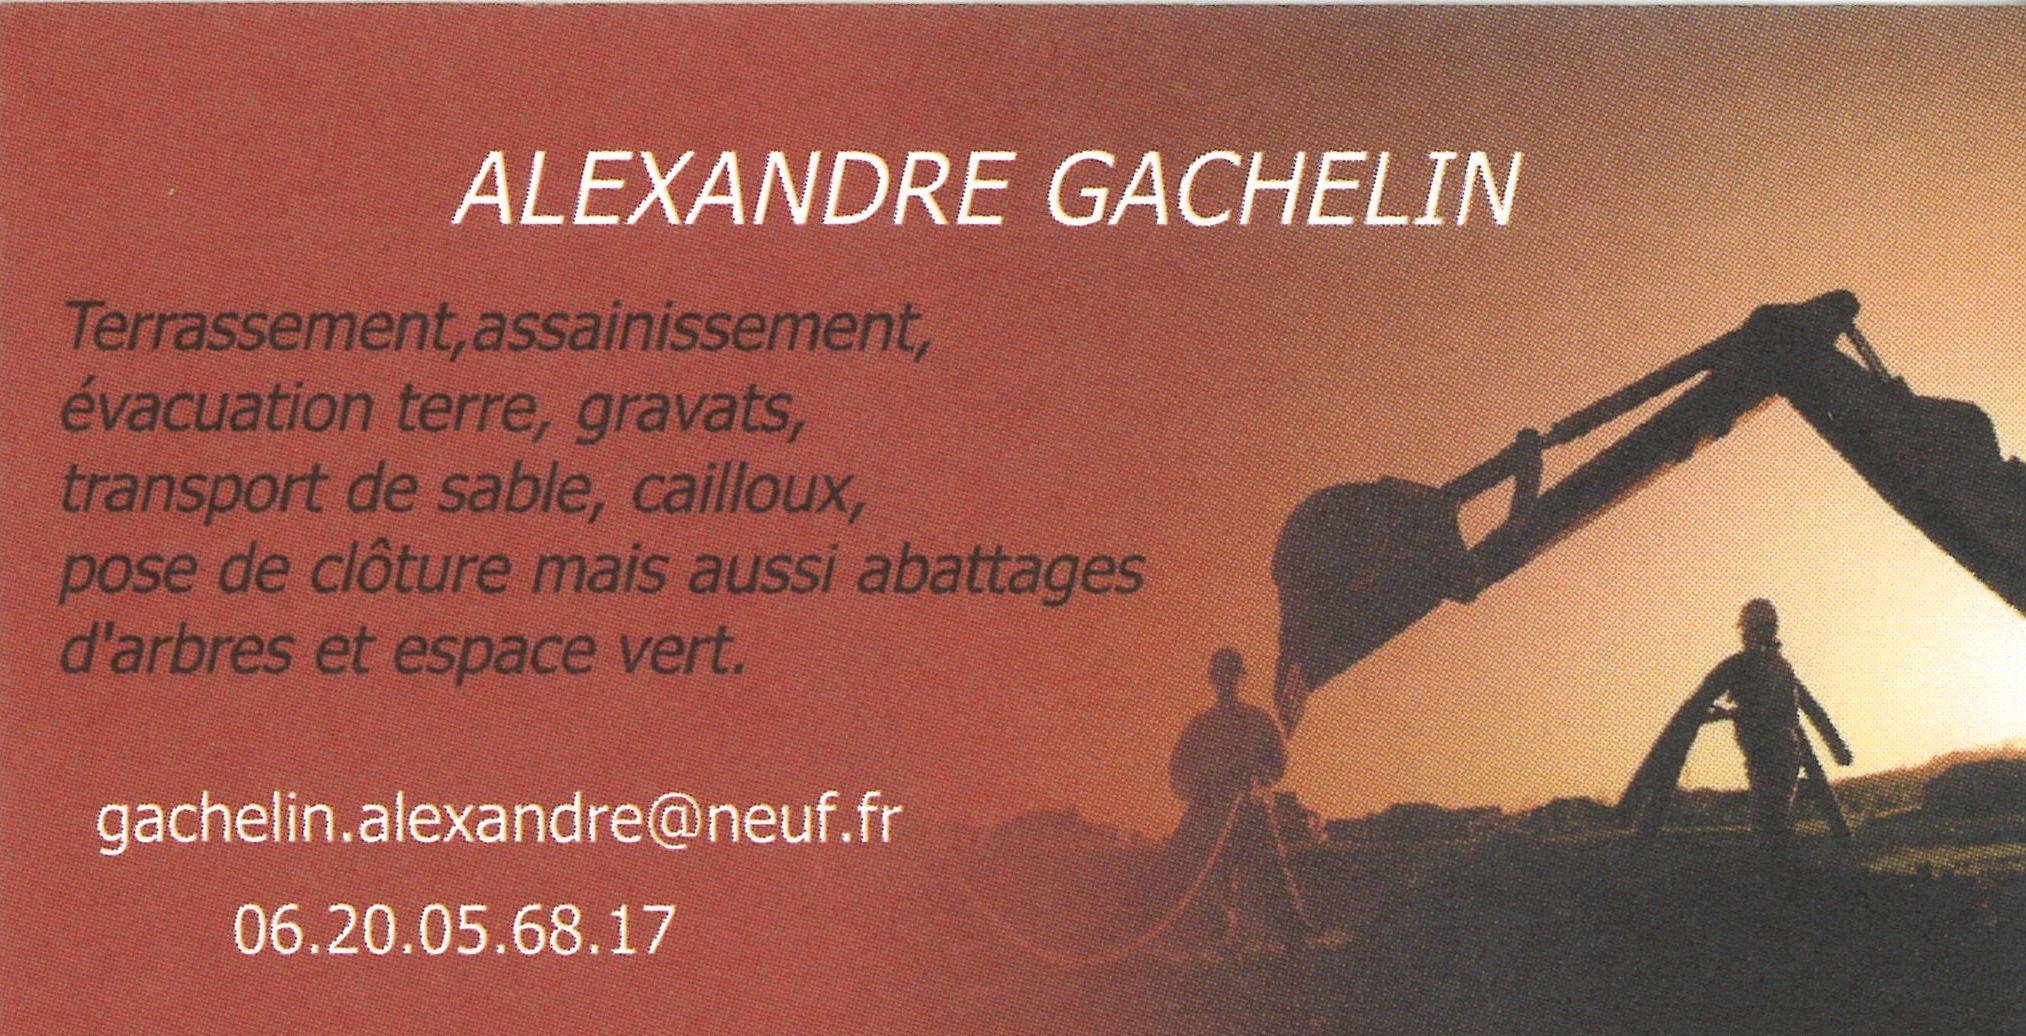 Alexandre gachelin